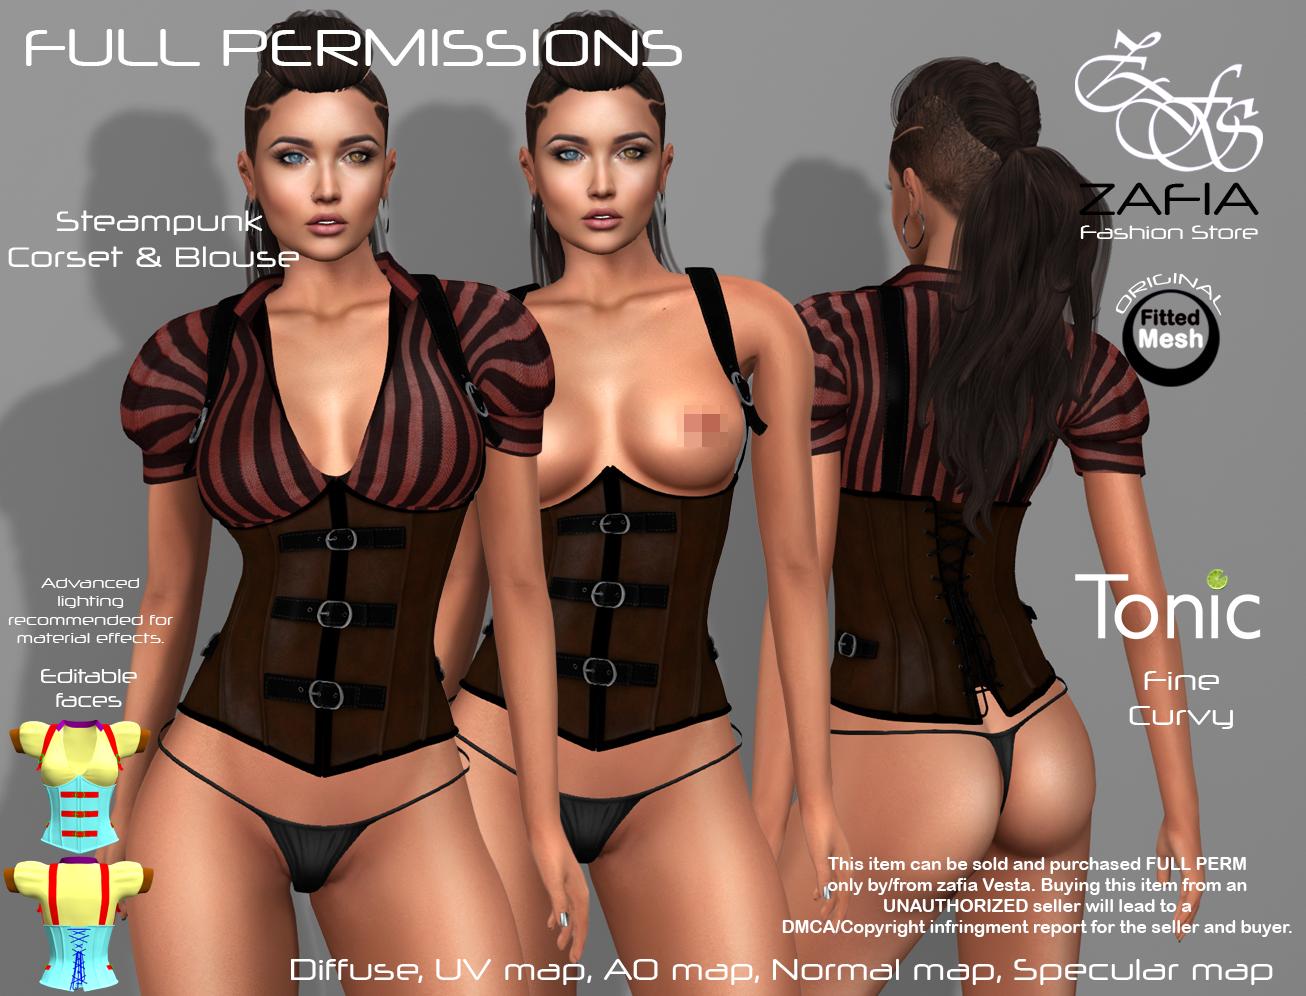 steampunk-corset-blouse-tonic